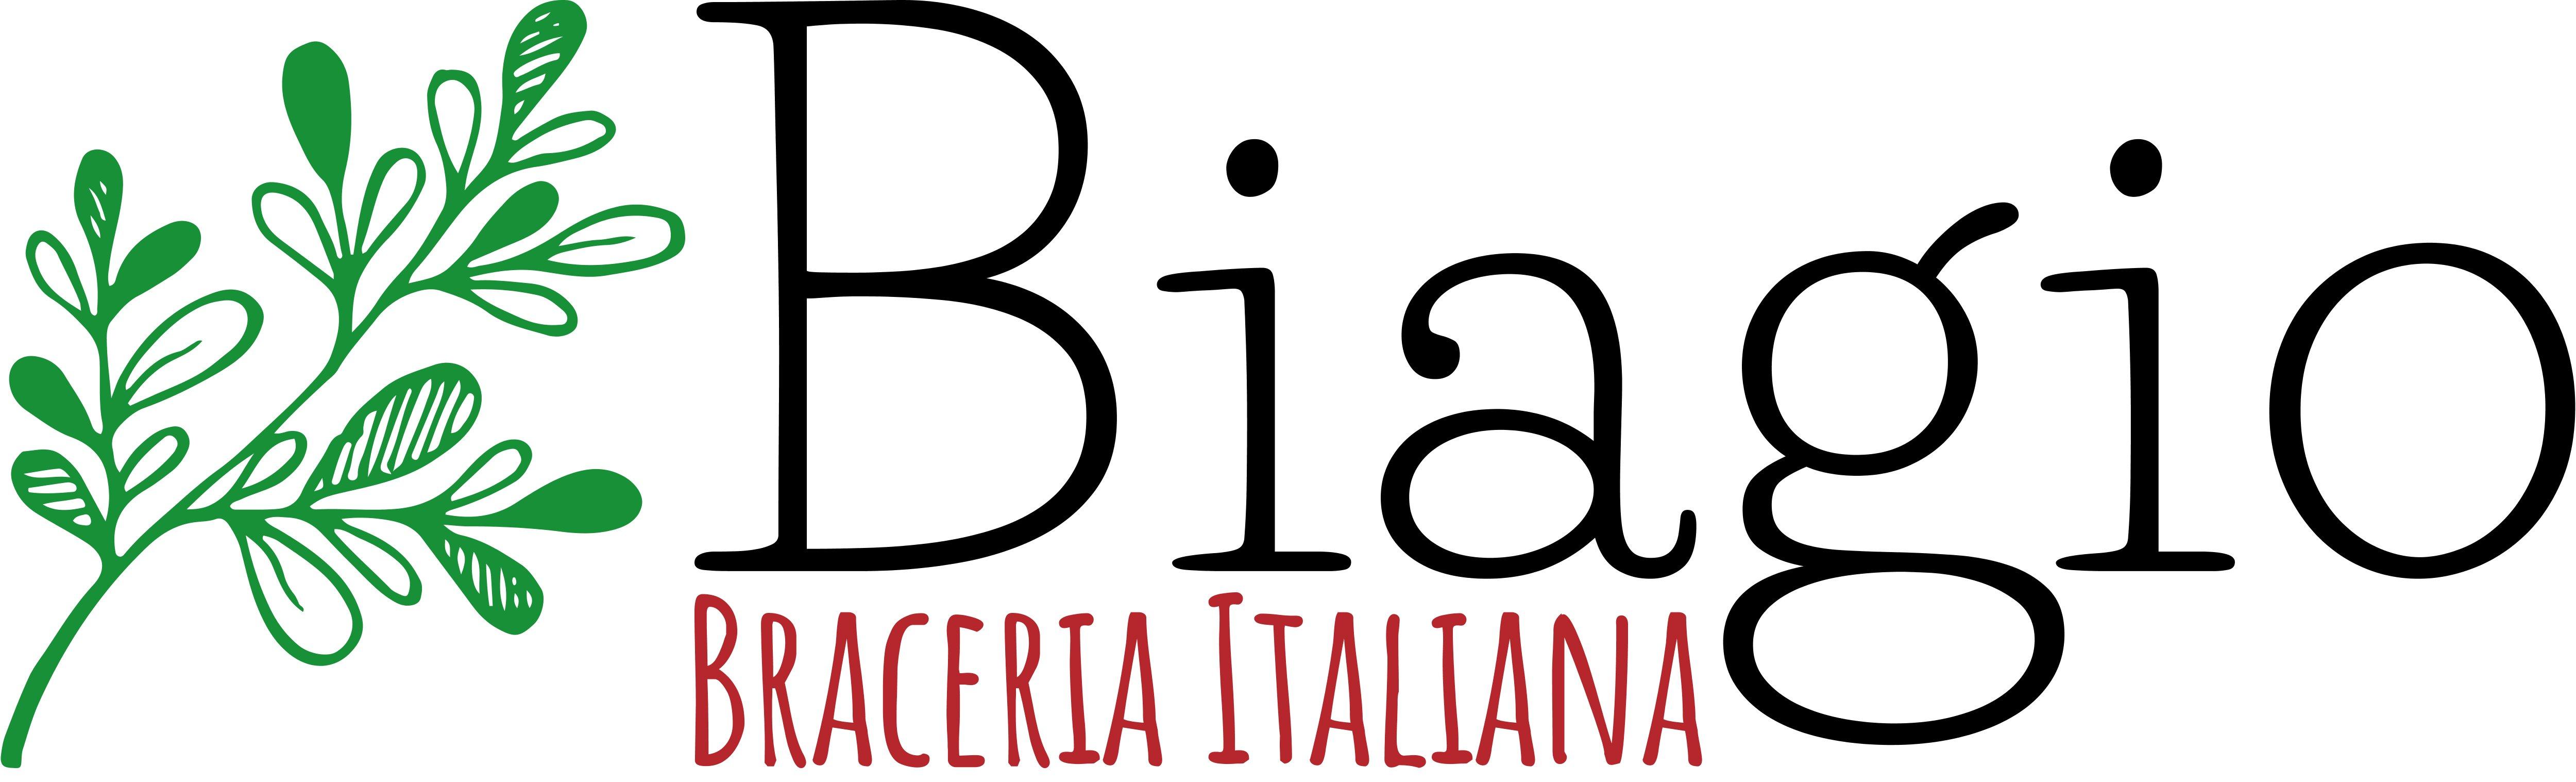 Biagio Braceria Italiana